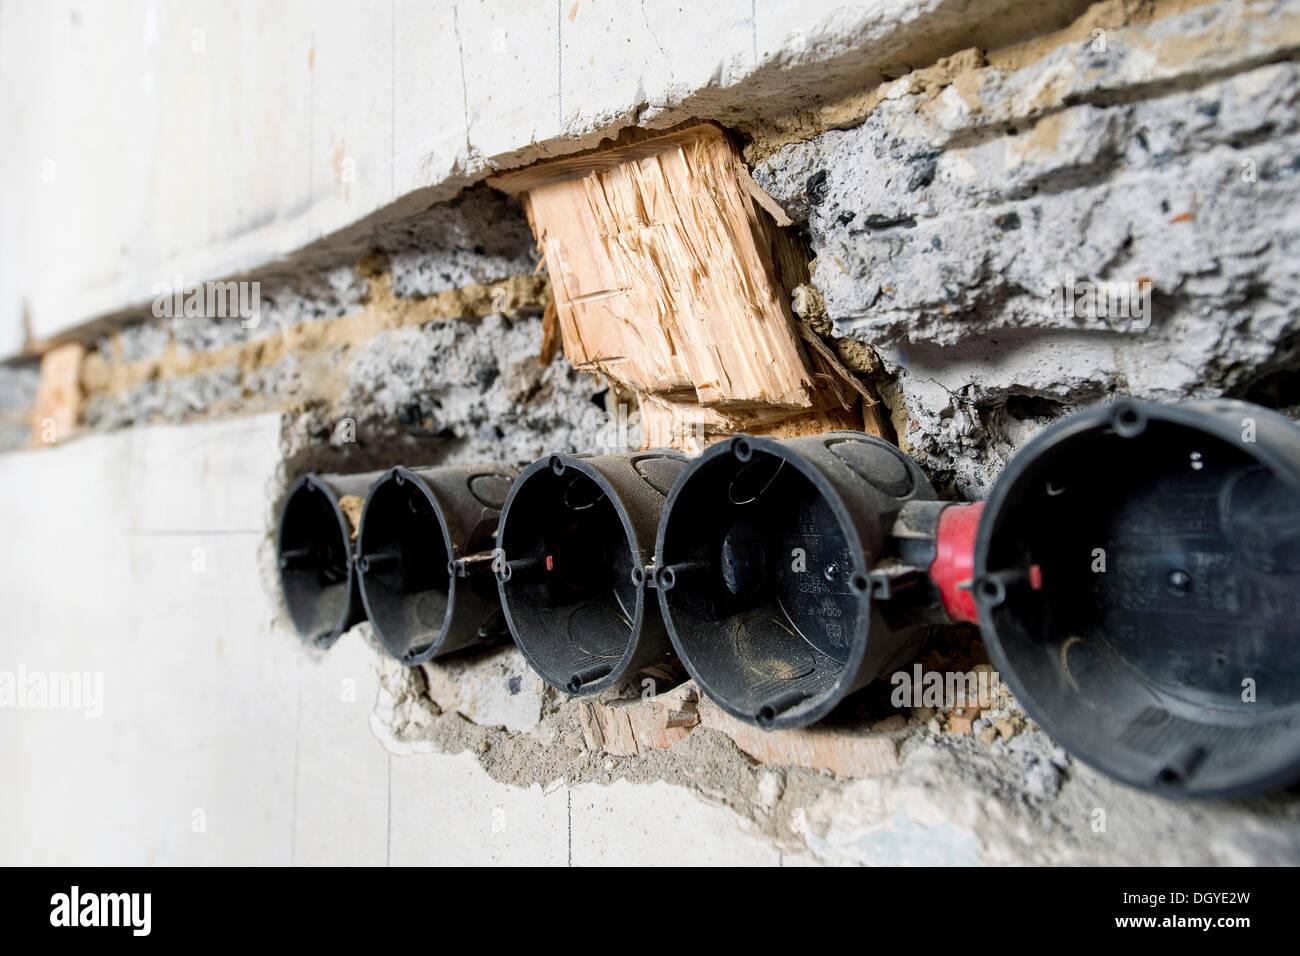 Vorbereitende arbeiten an der wand f r neue kabel kan le - Abdeckung fur heizungsrohre an der wand ...